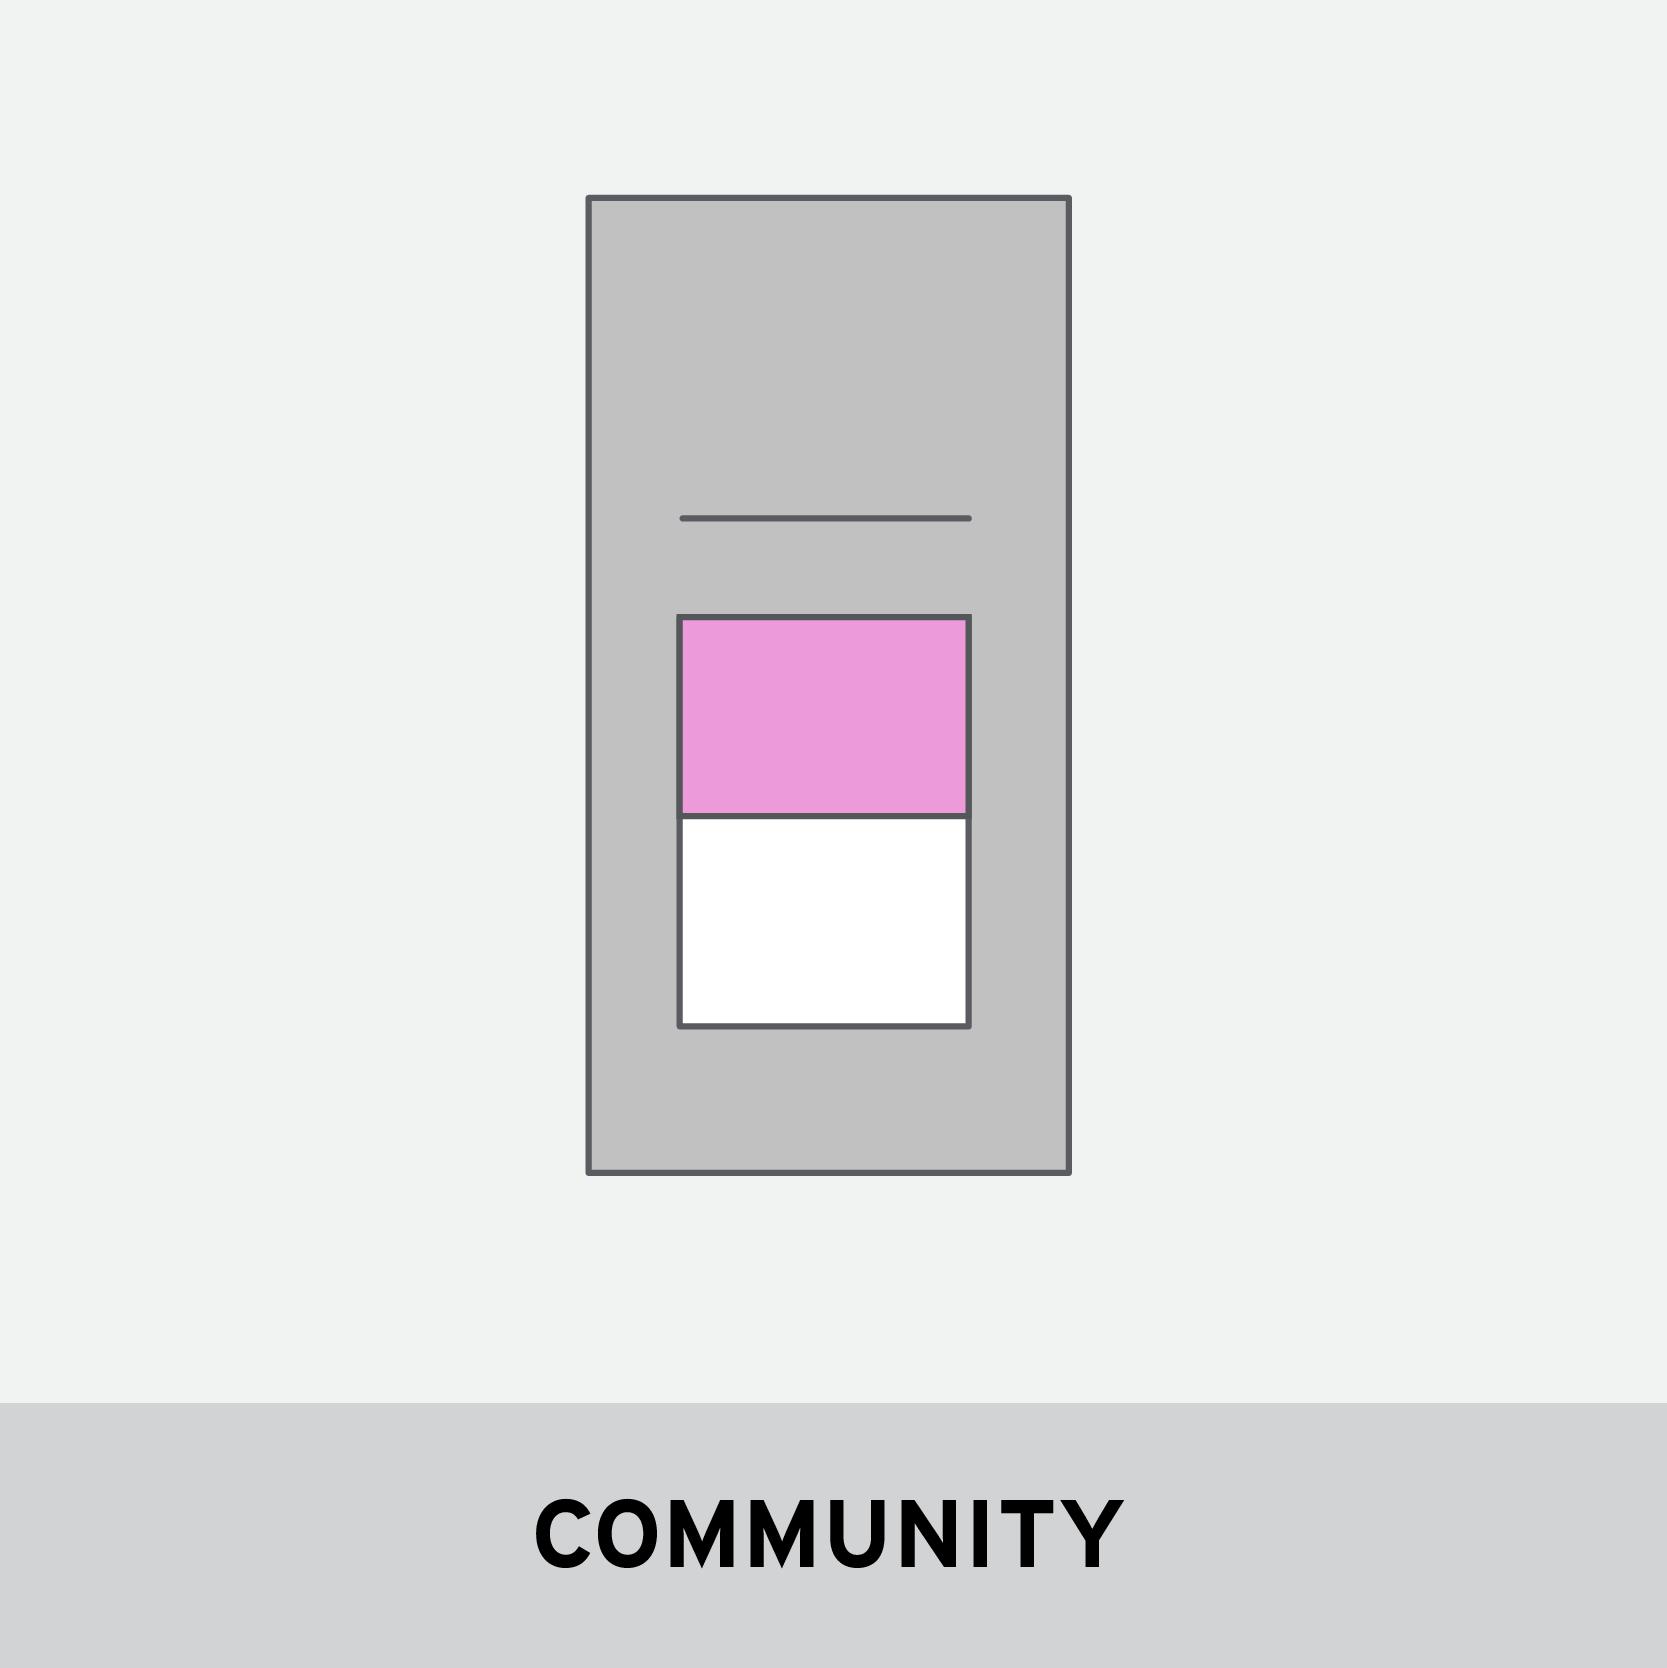 COMMUNITY PARAMETERS